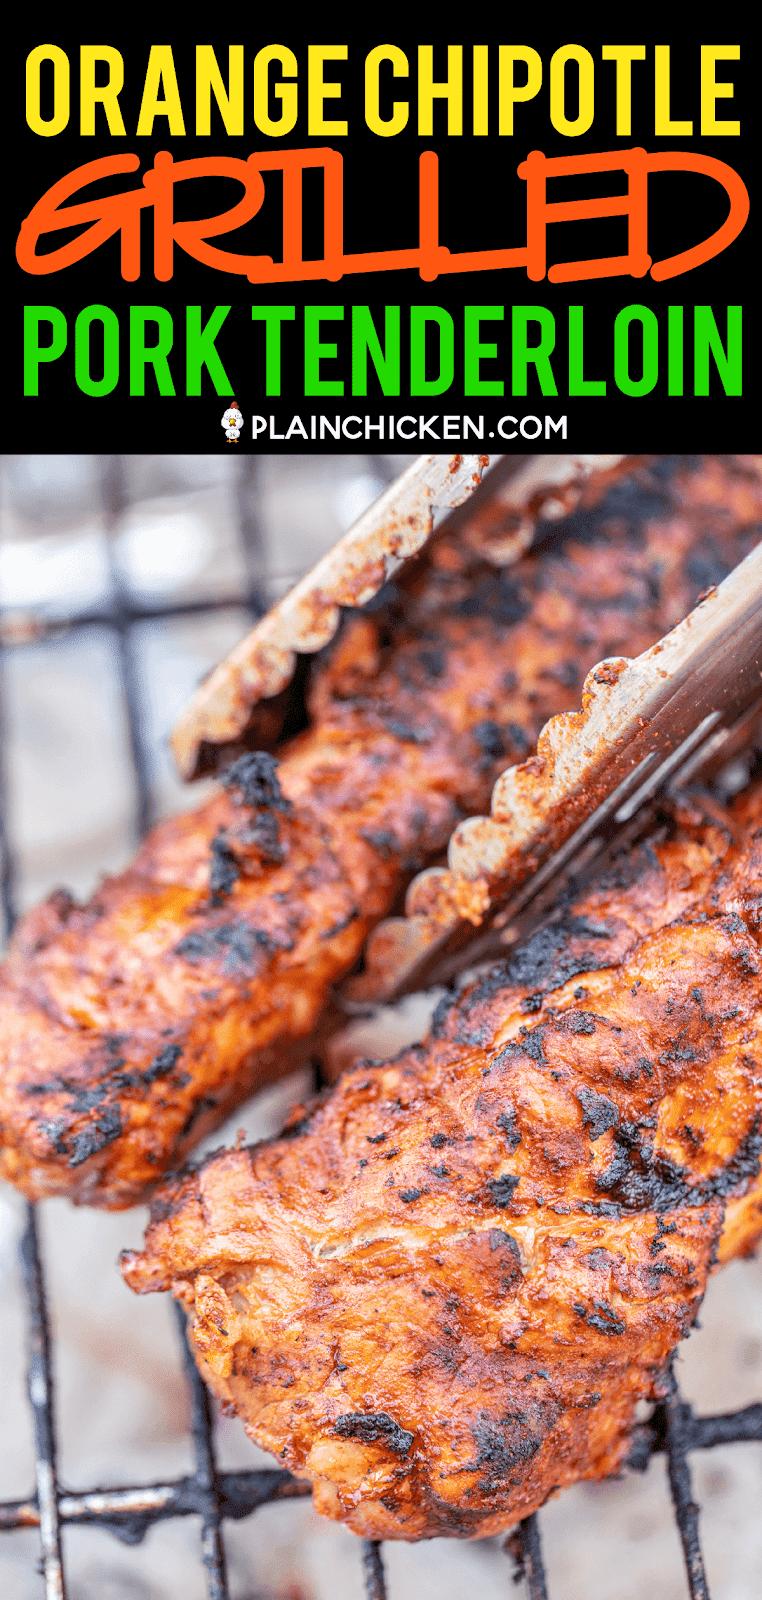 pork tenderloin cooking on the grill